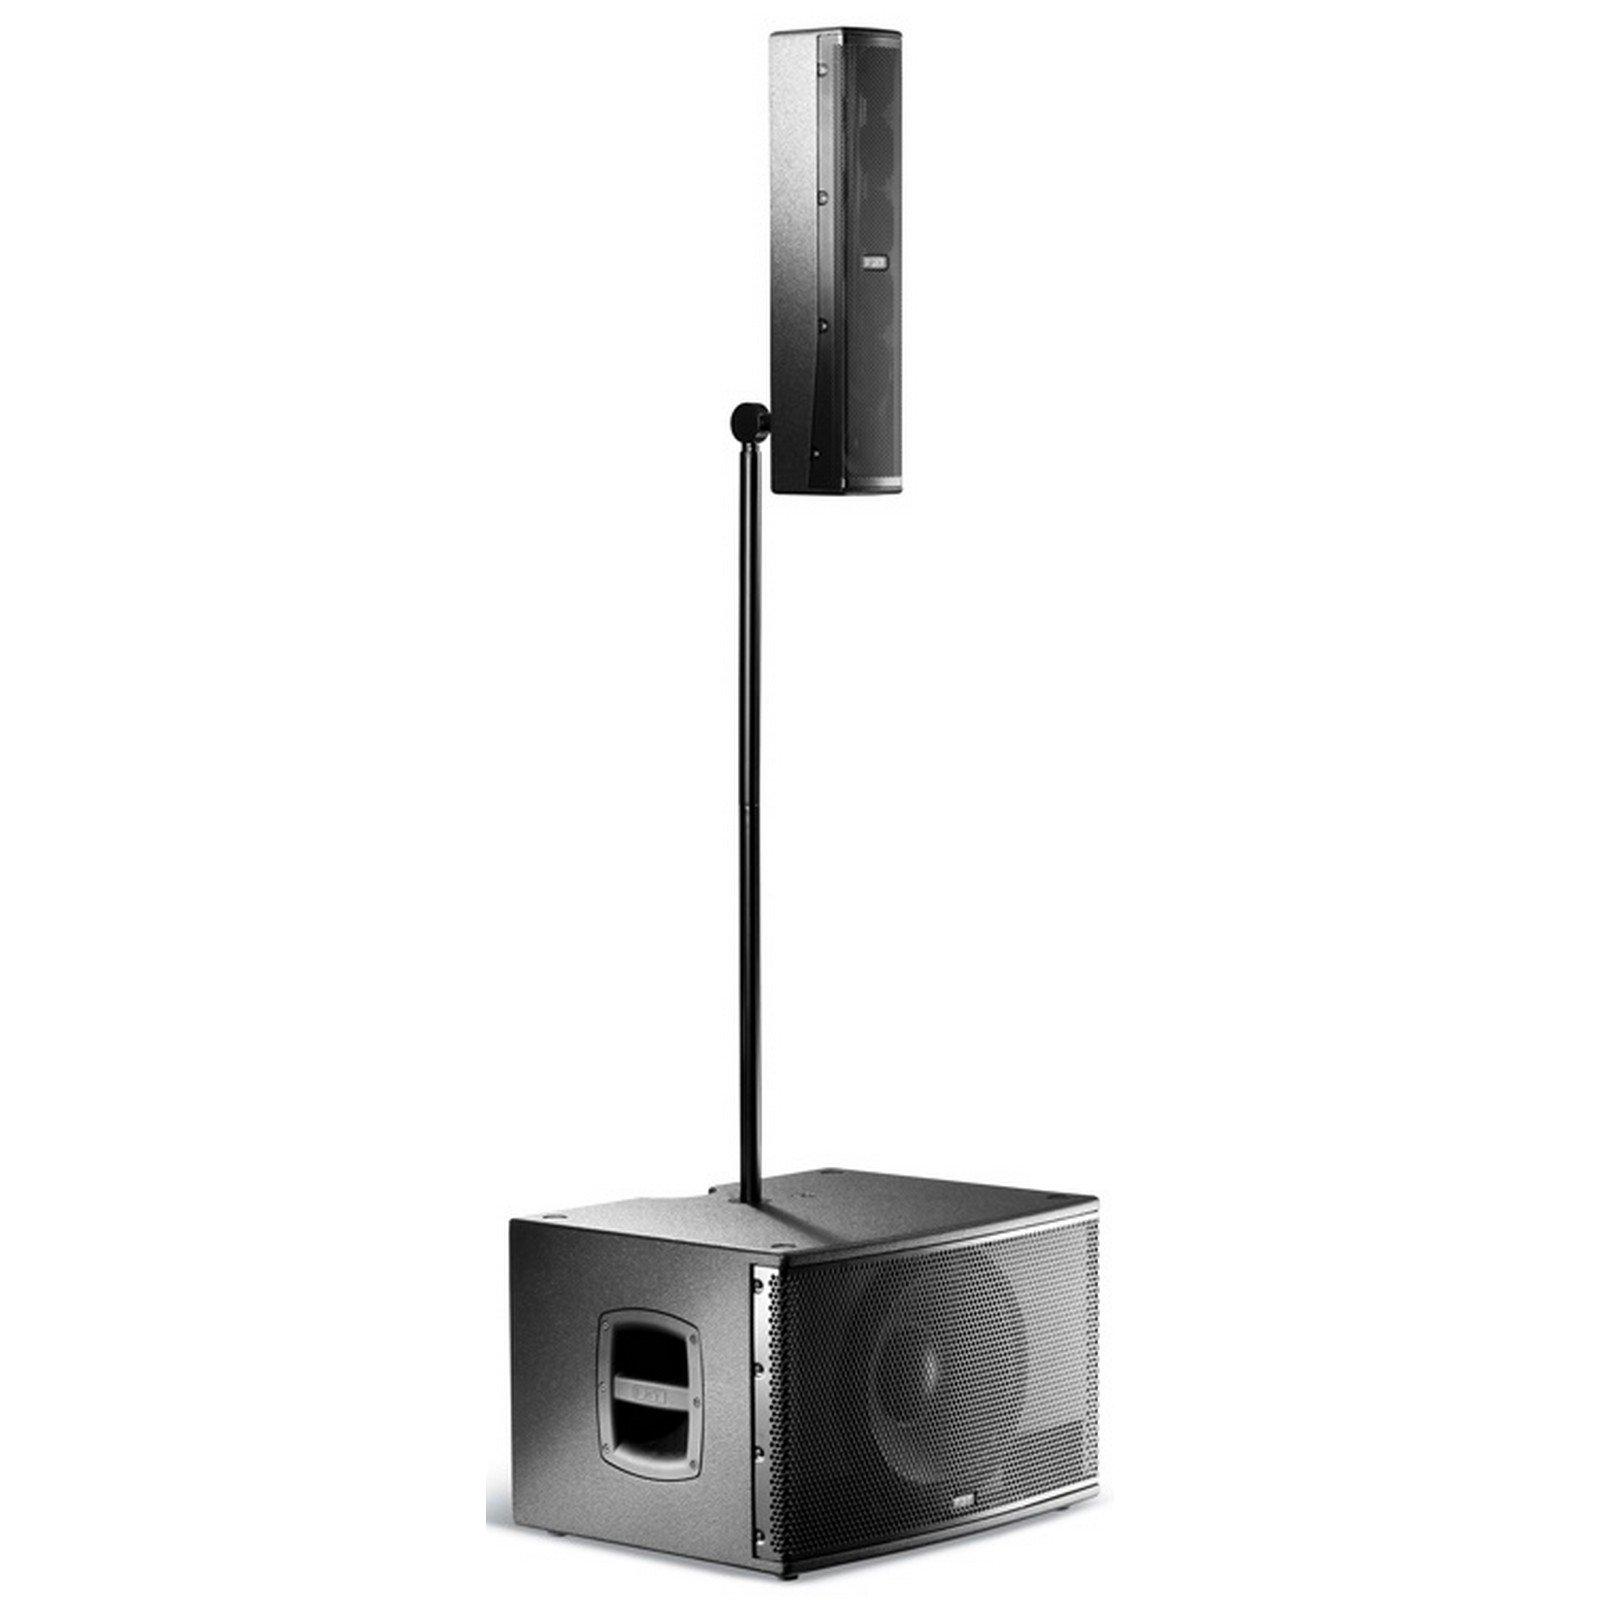 FBT Vertus CS-1000, 2 Way 1000W Line Array Speaker System Black